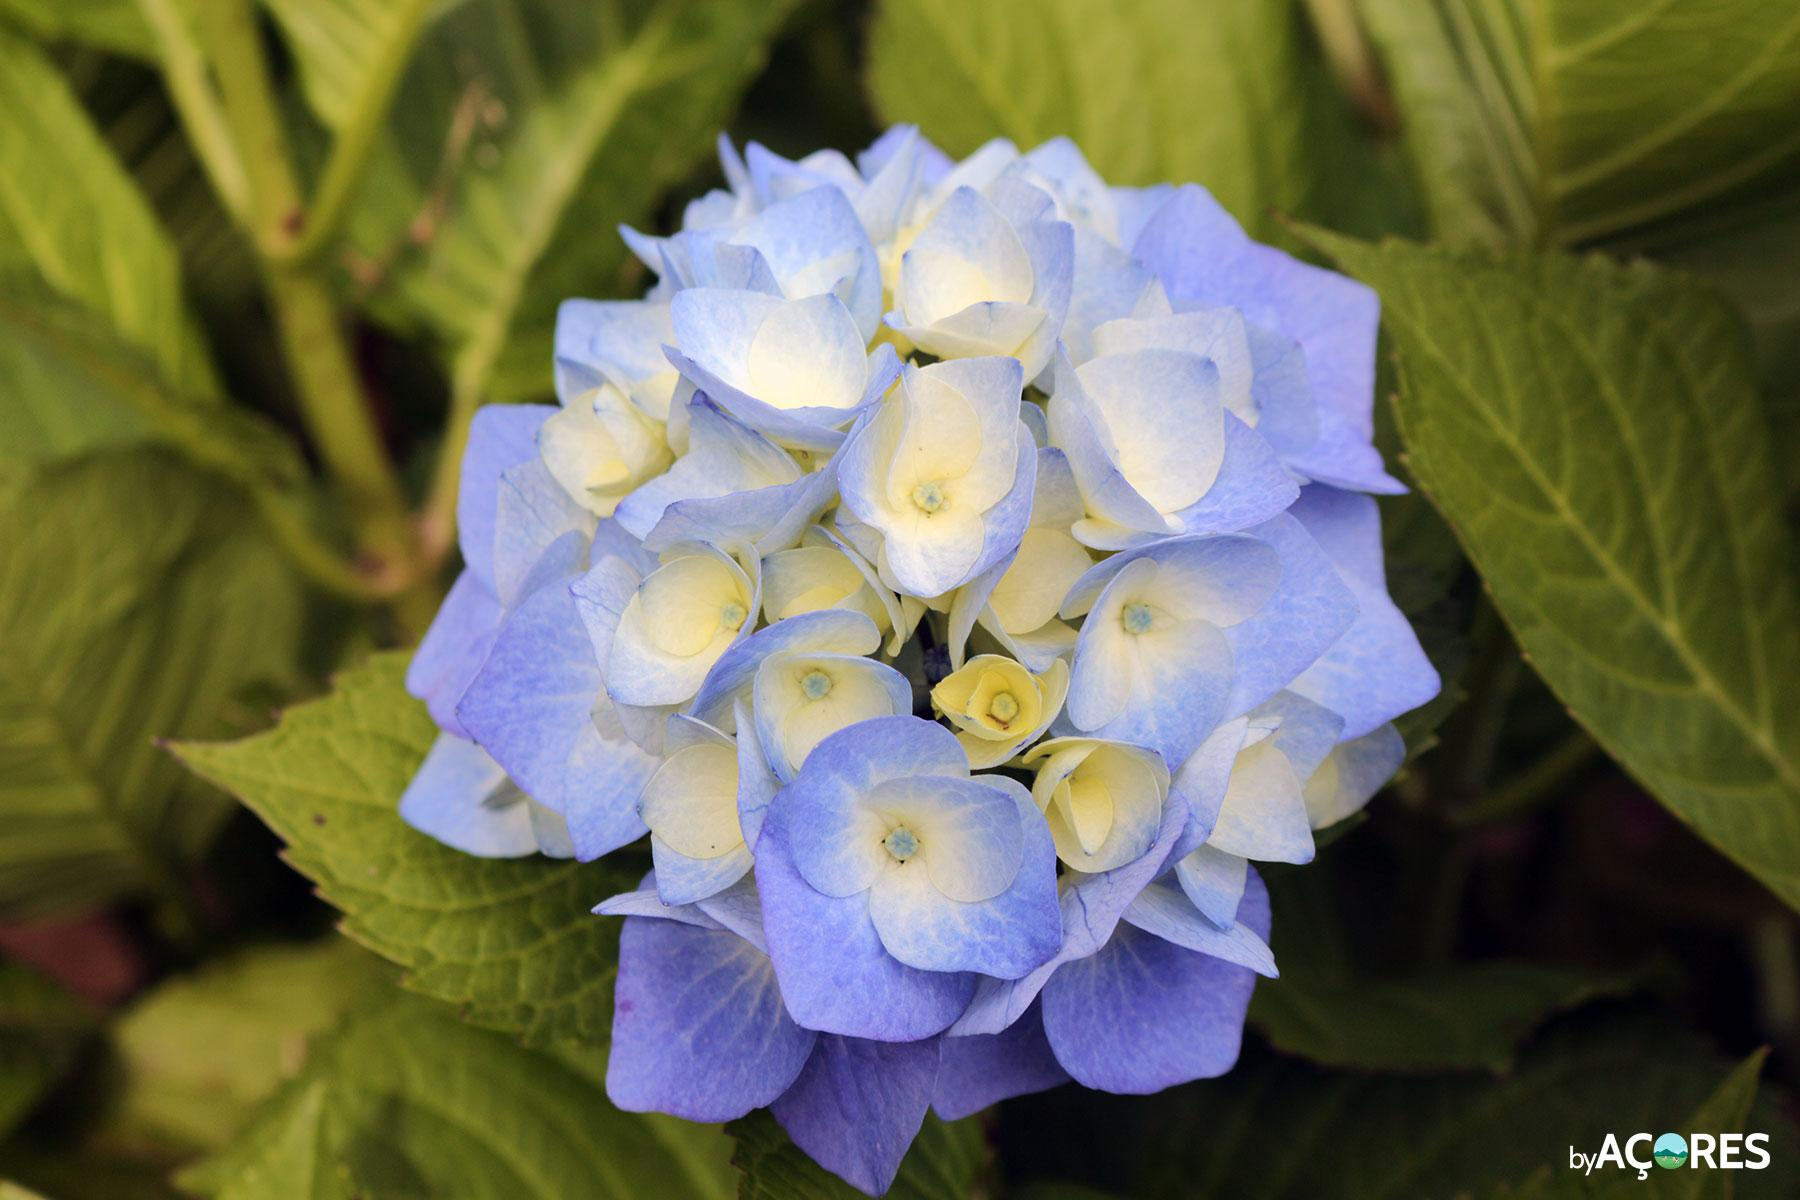 Hortênsia a florir